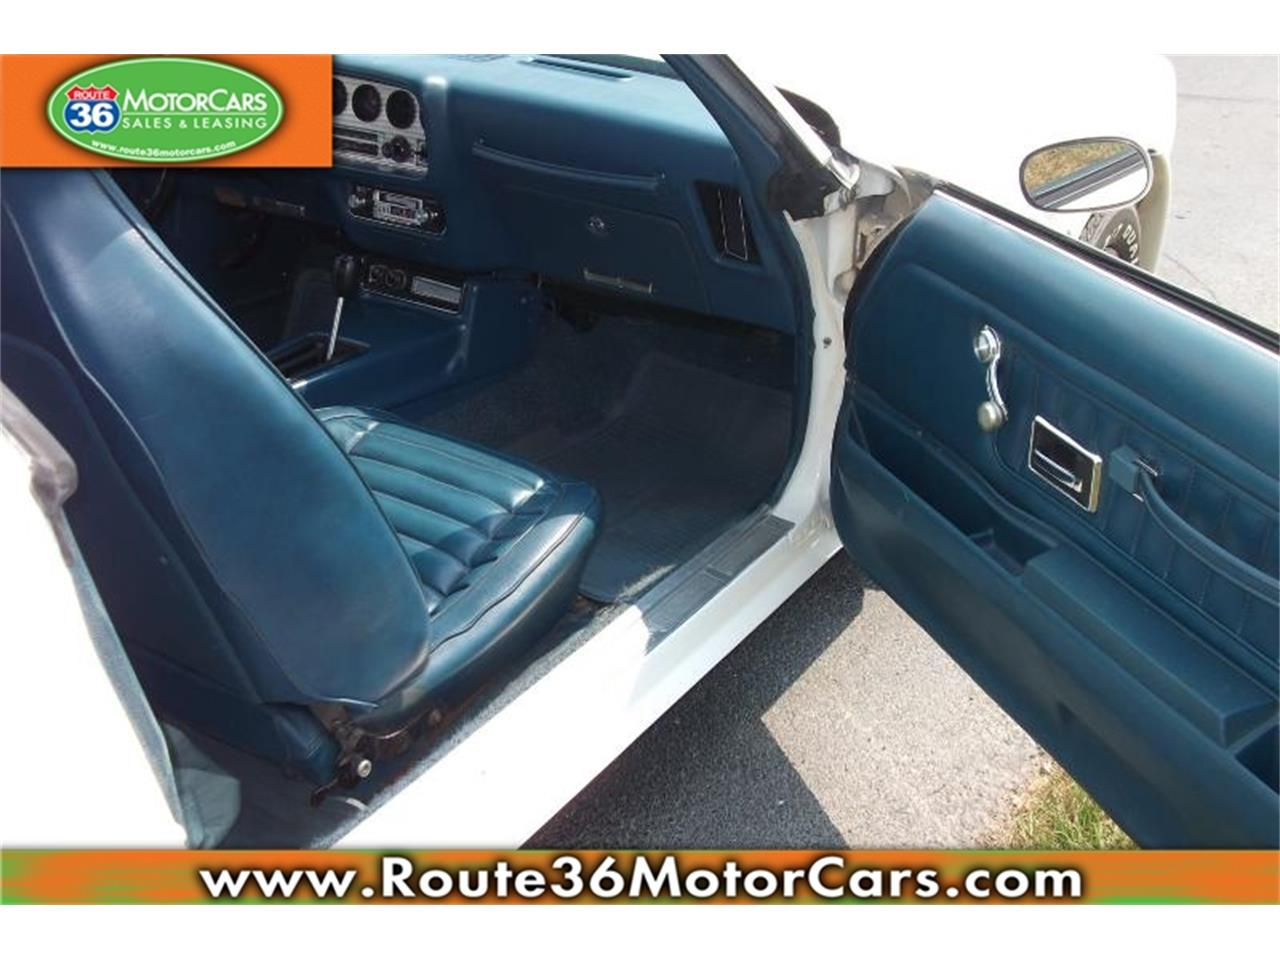 Large Picture of '72 Pontiac Firebird located in Ohio - IKH6